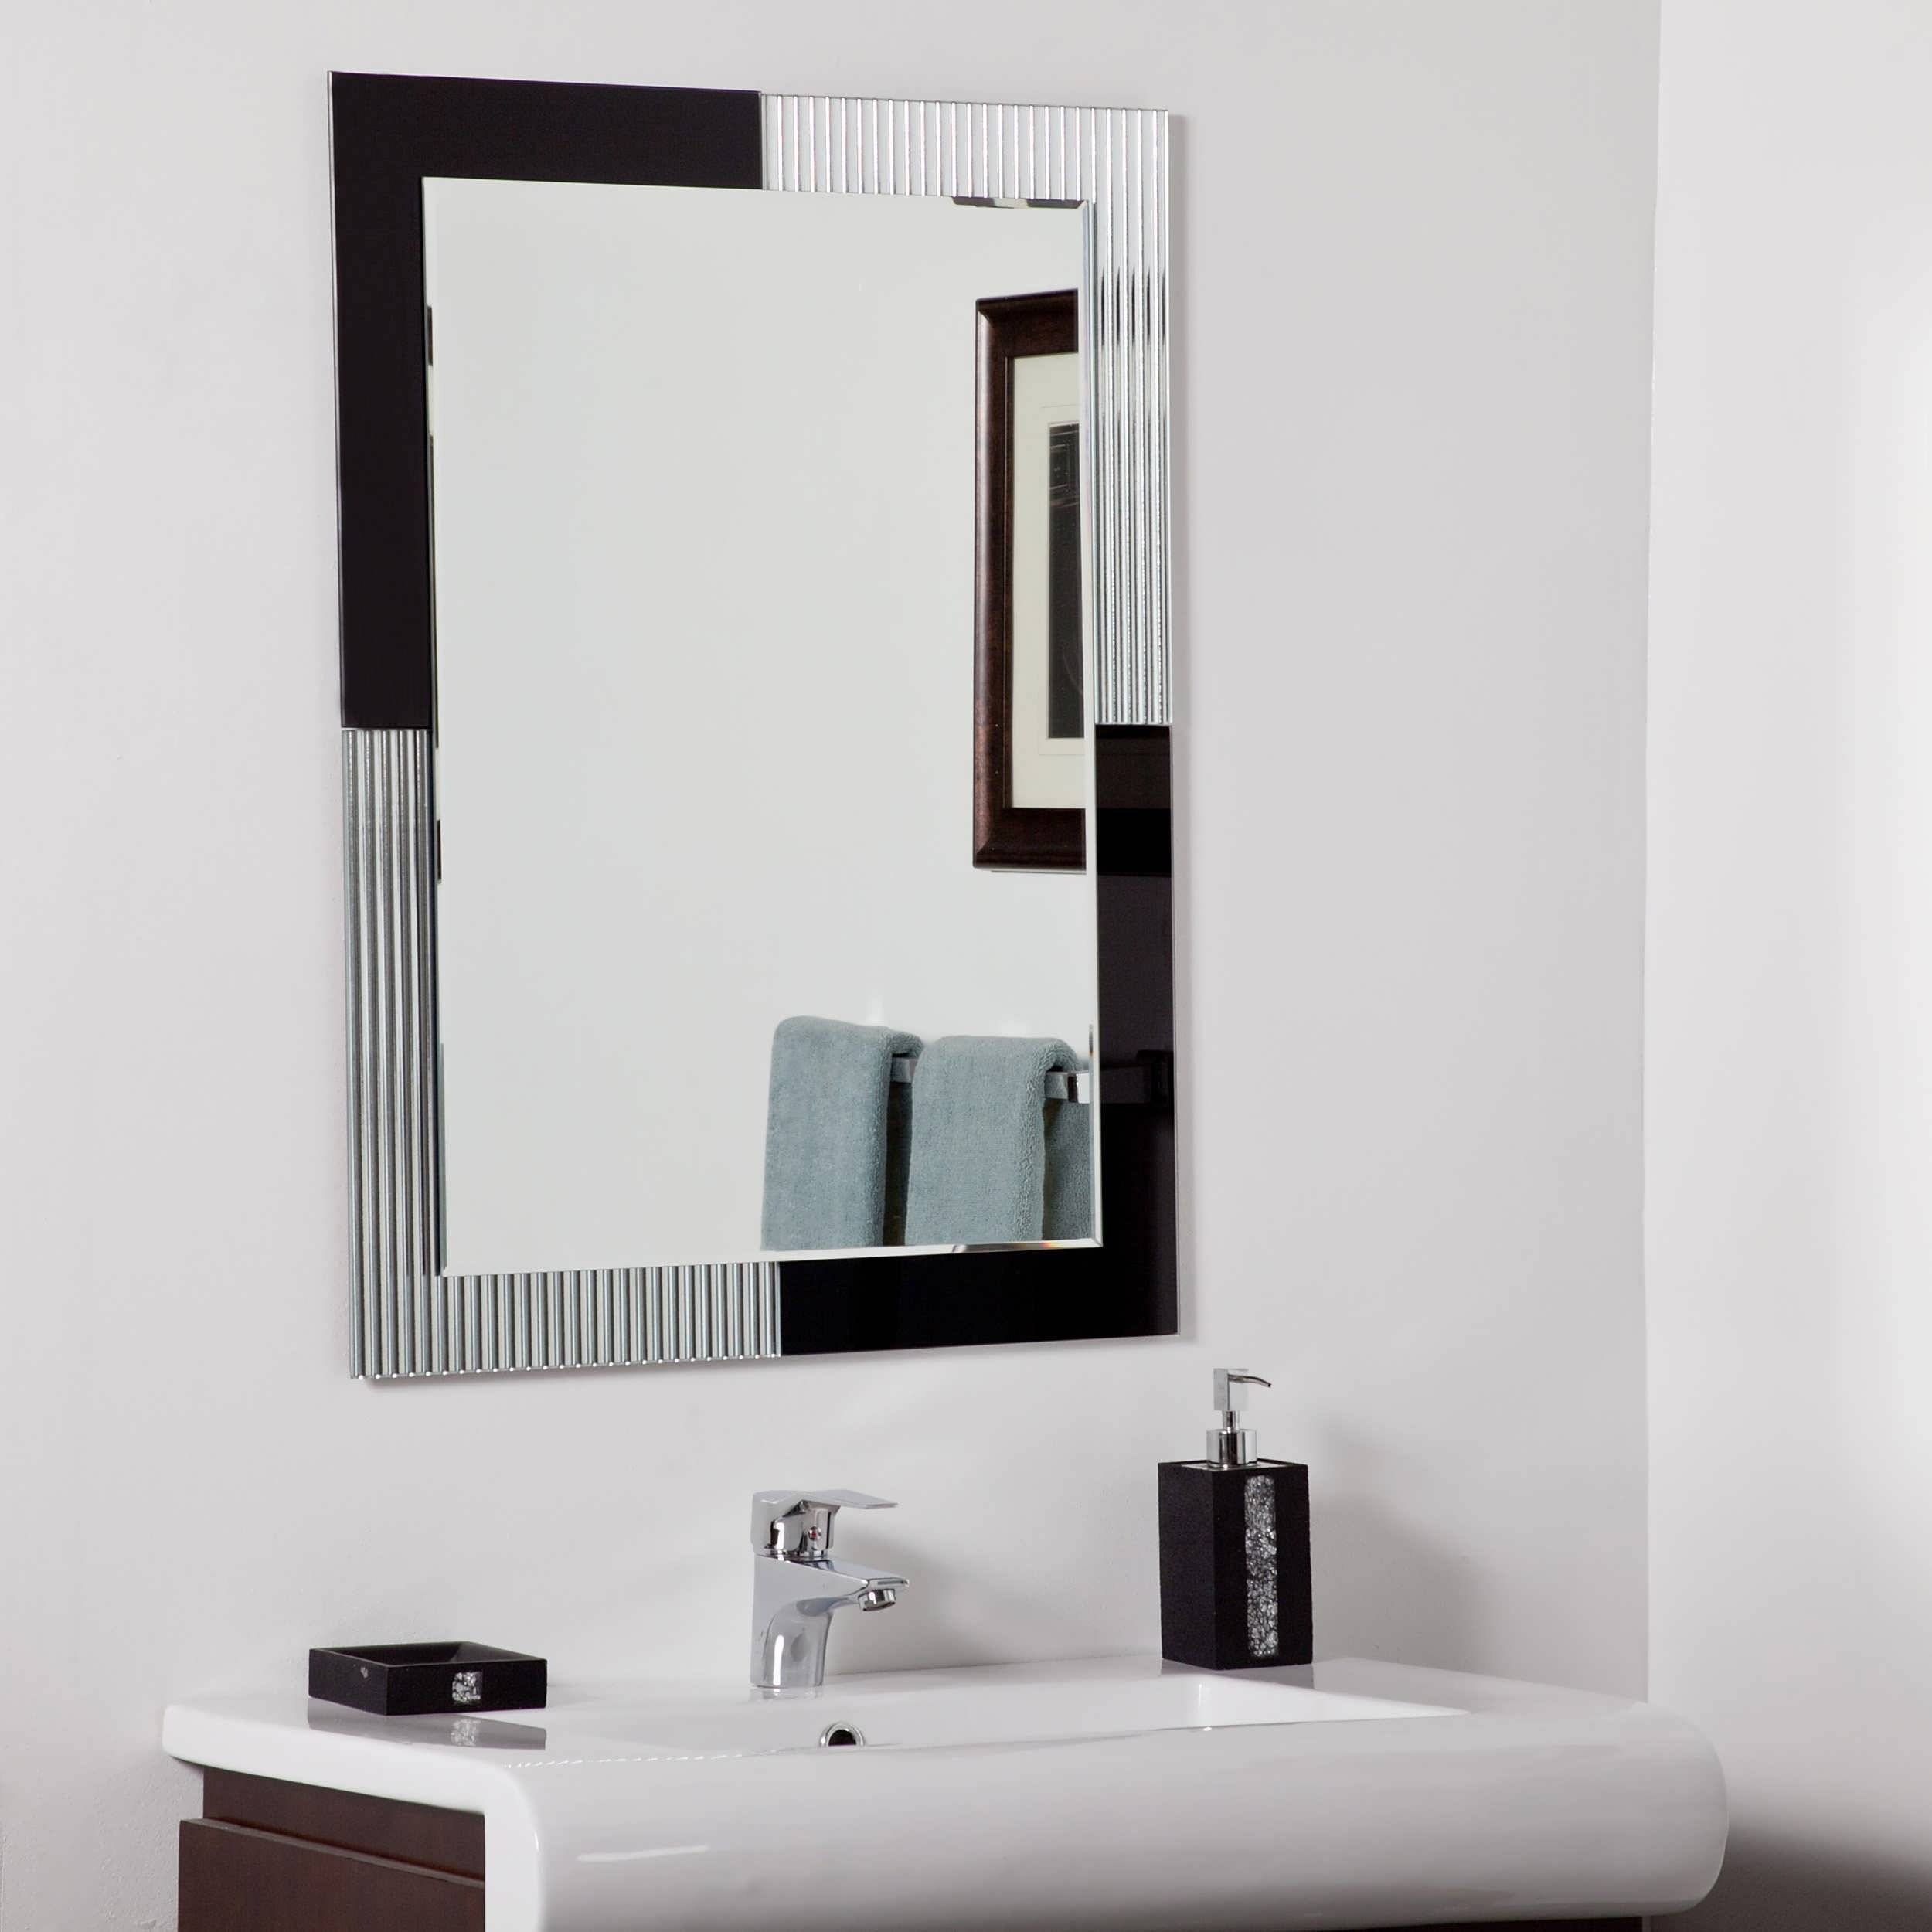 Bathroom Cabinets : Large Art Deco Mirror Illuminated Bathroom inside Art Deco Full Length Mirrors (Image 6 of 15)